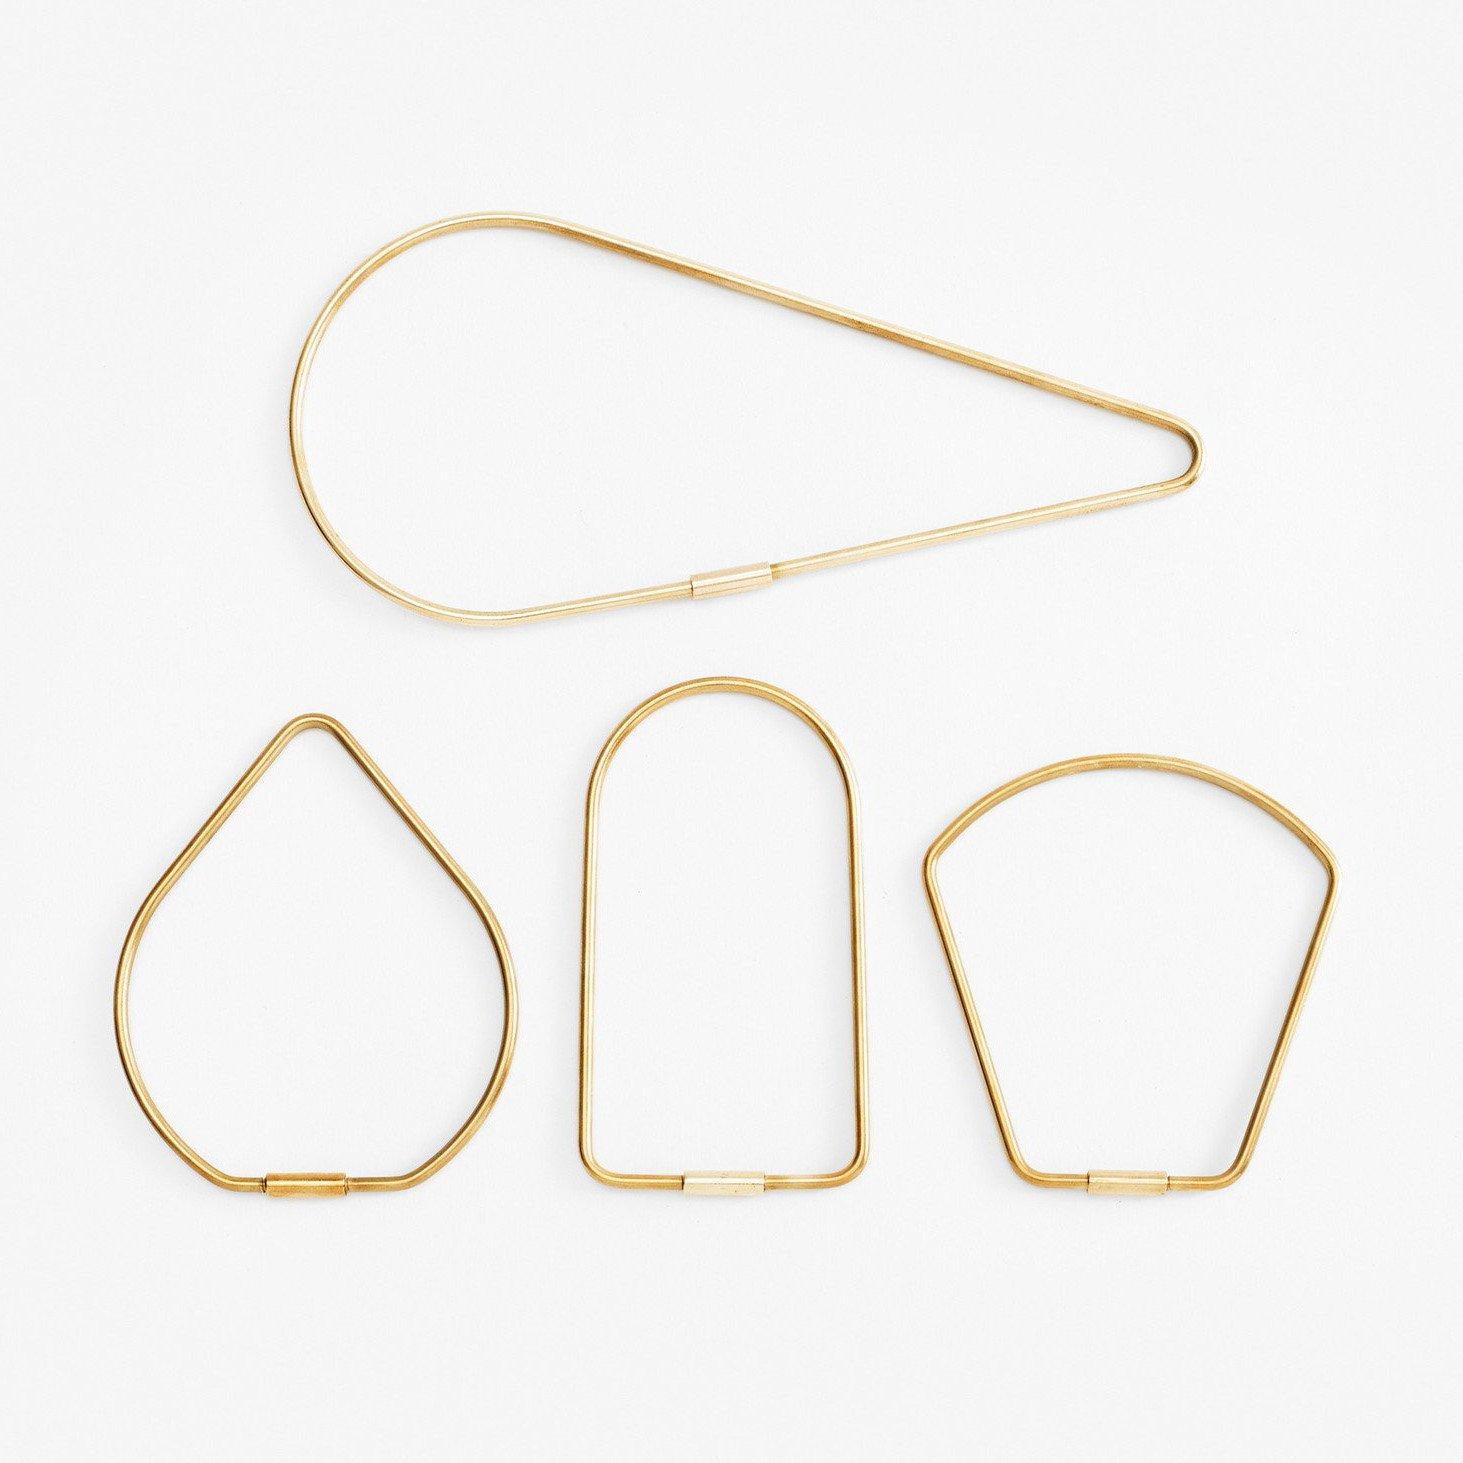 contour-key-rings-brass-9